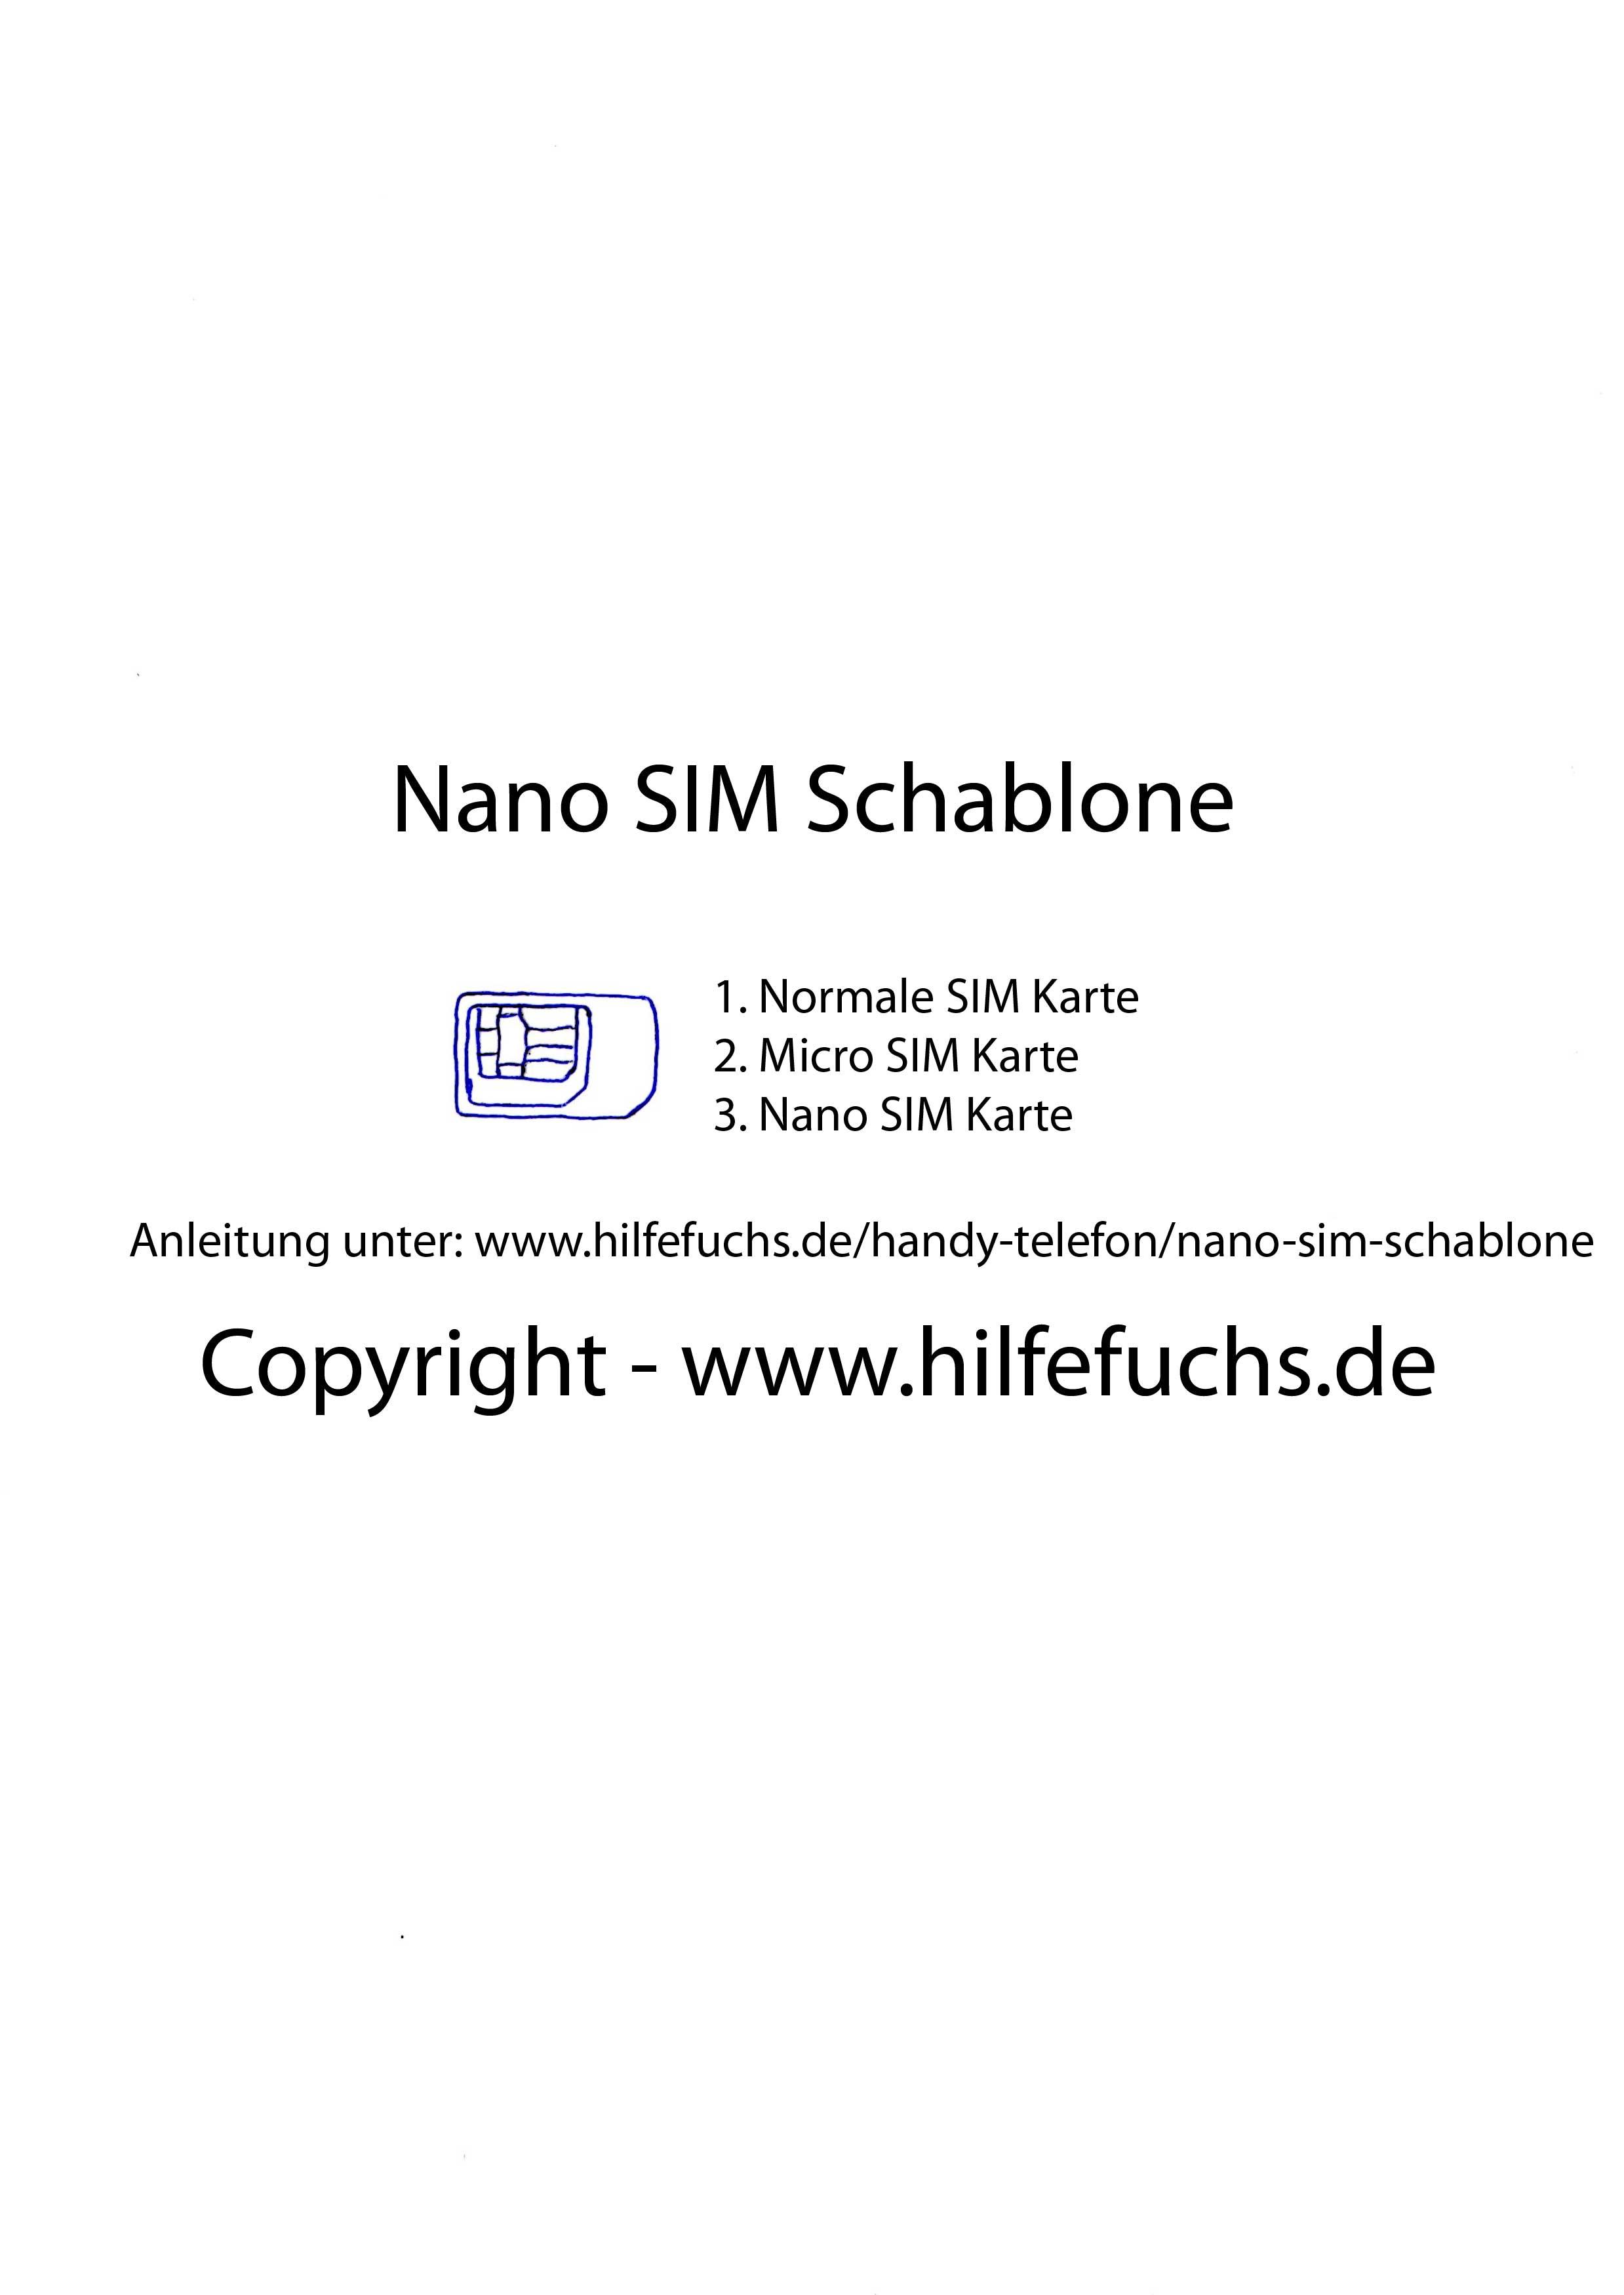 Nano Karte Zuschneiden.Nano Sim Für Das Iphone 5 Zuschneiden Nano Sim Schablone Zum